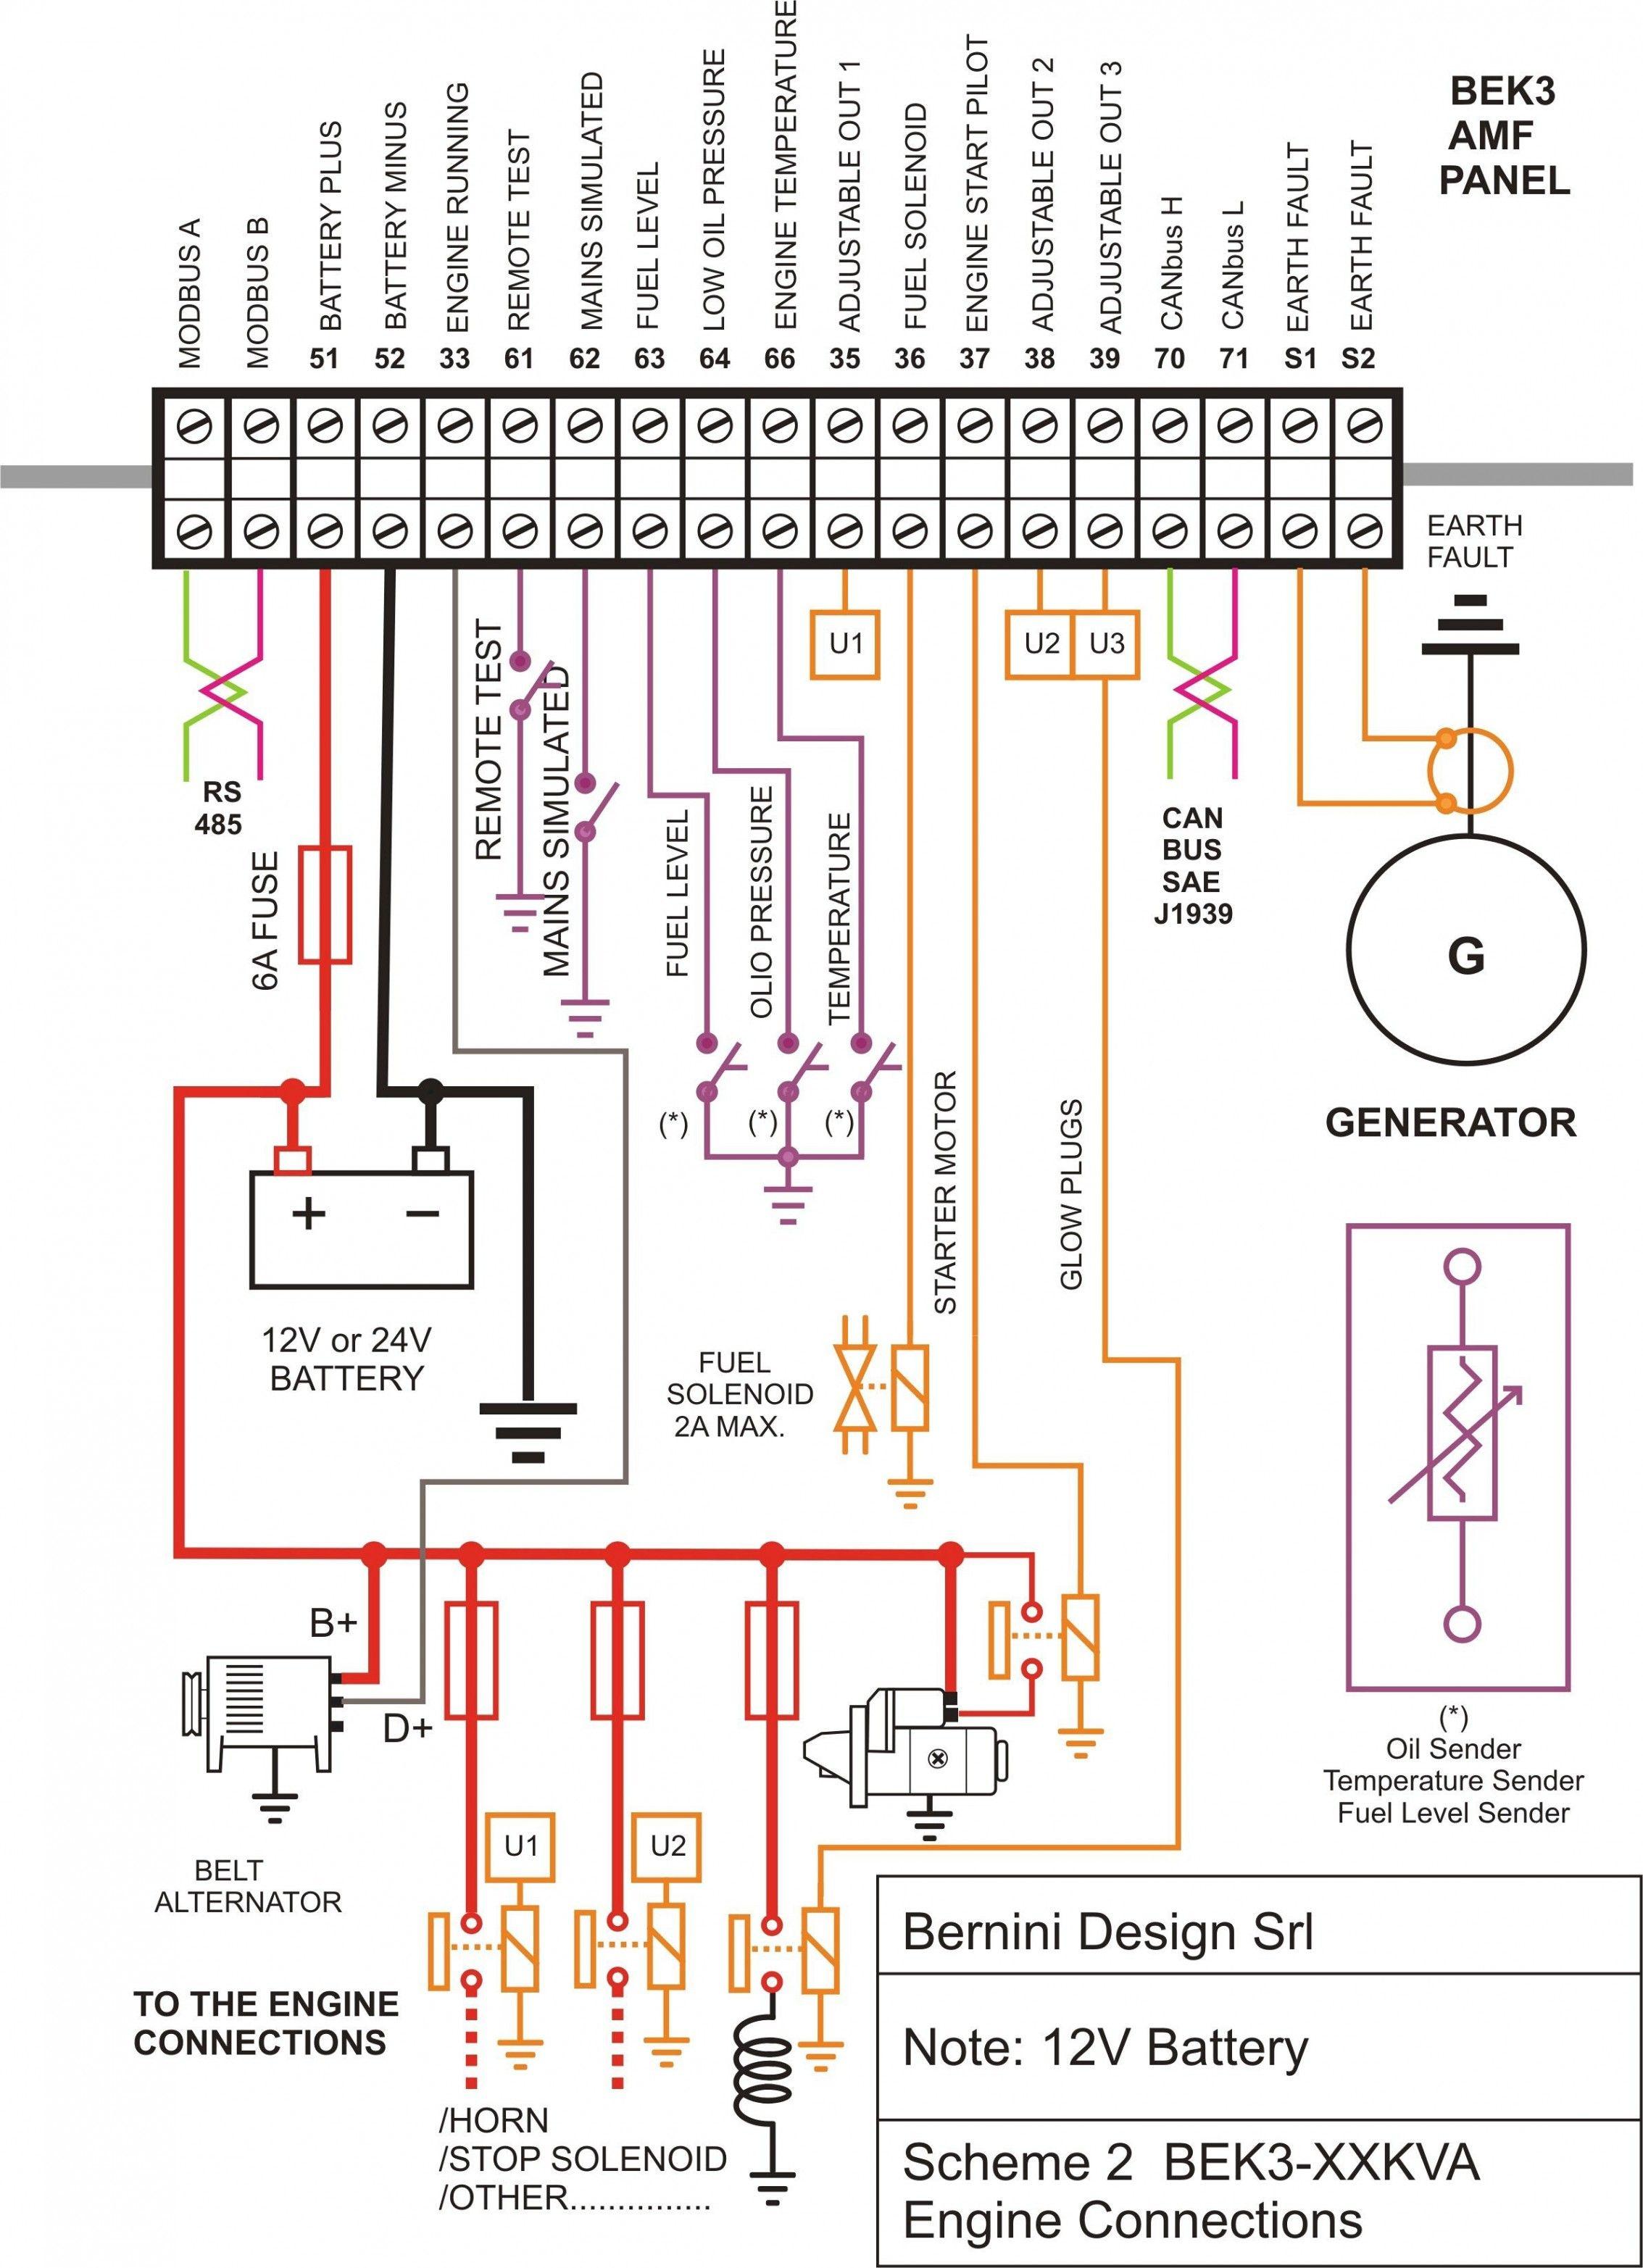 25 Good Wiring Diagram Software Technique Https Bacamajalah Com 25 Good Wiring D Electrical Circuit Diagram Basic Electrical Wiring Electrical Panel Wiring